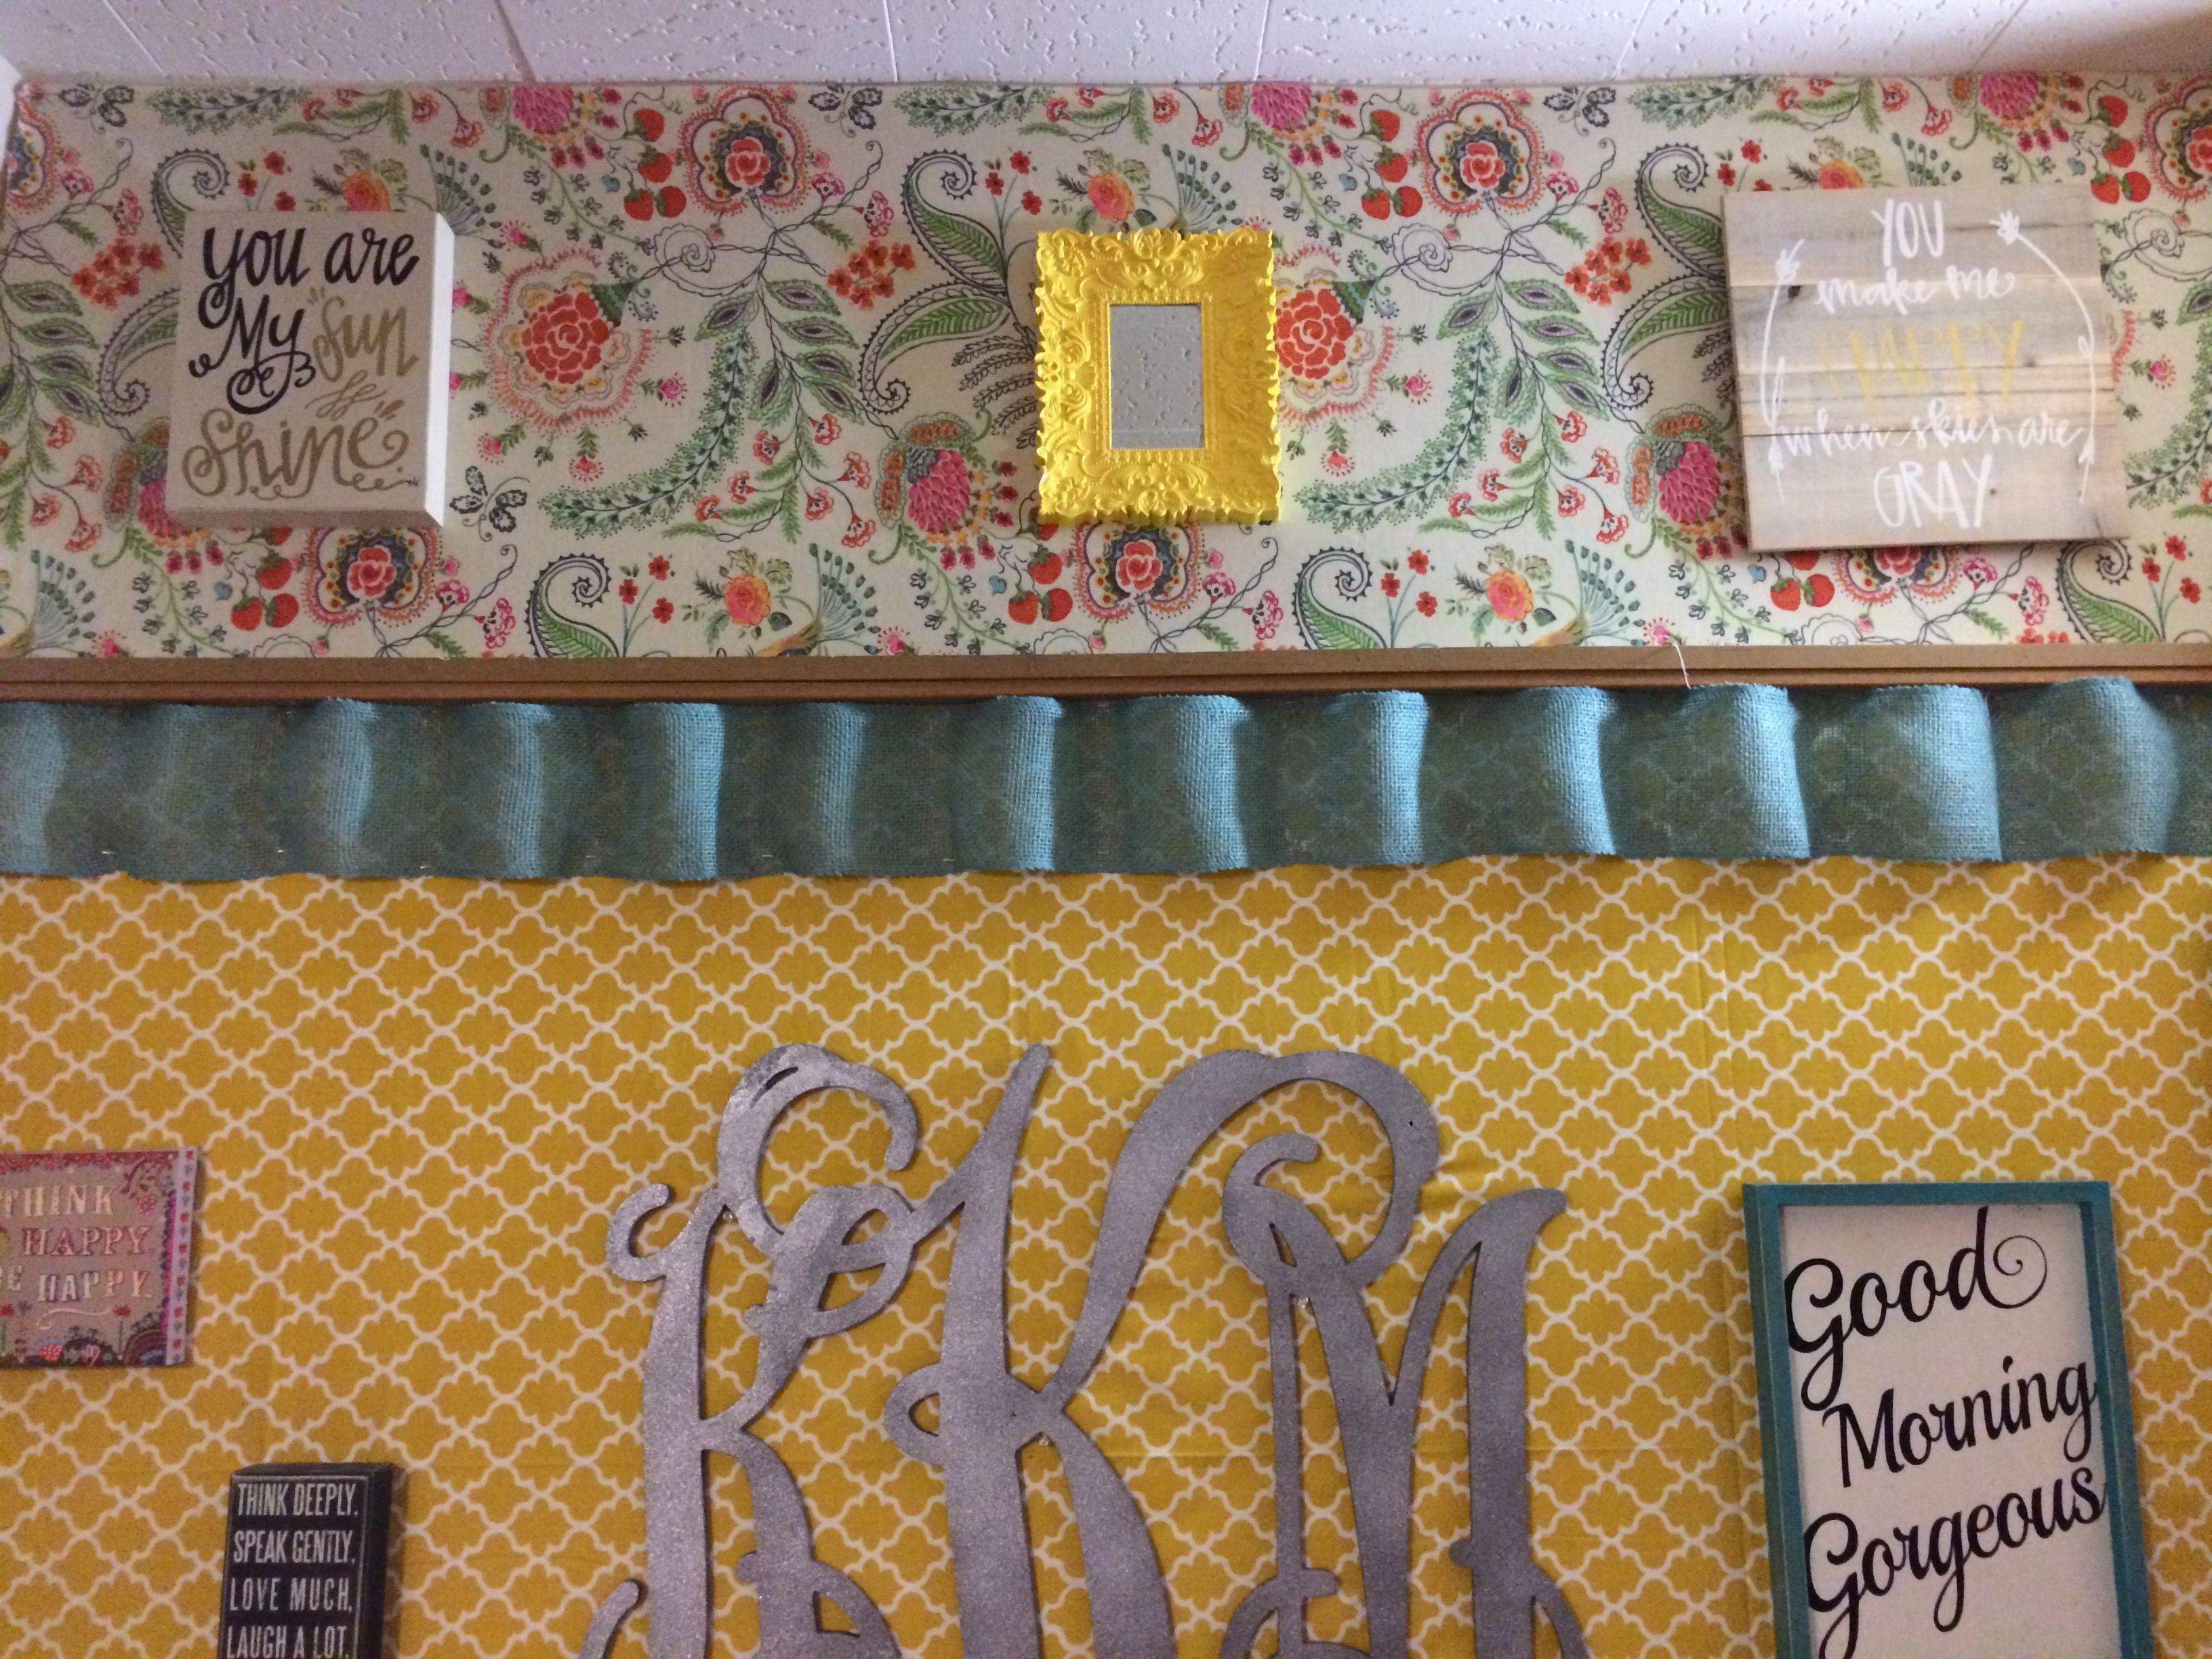 Pin by Kristy Keach on Murdough Room @ TTU | Good morning ...